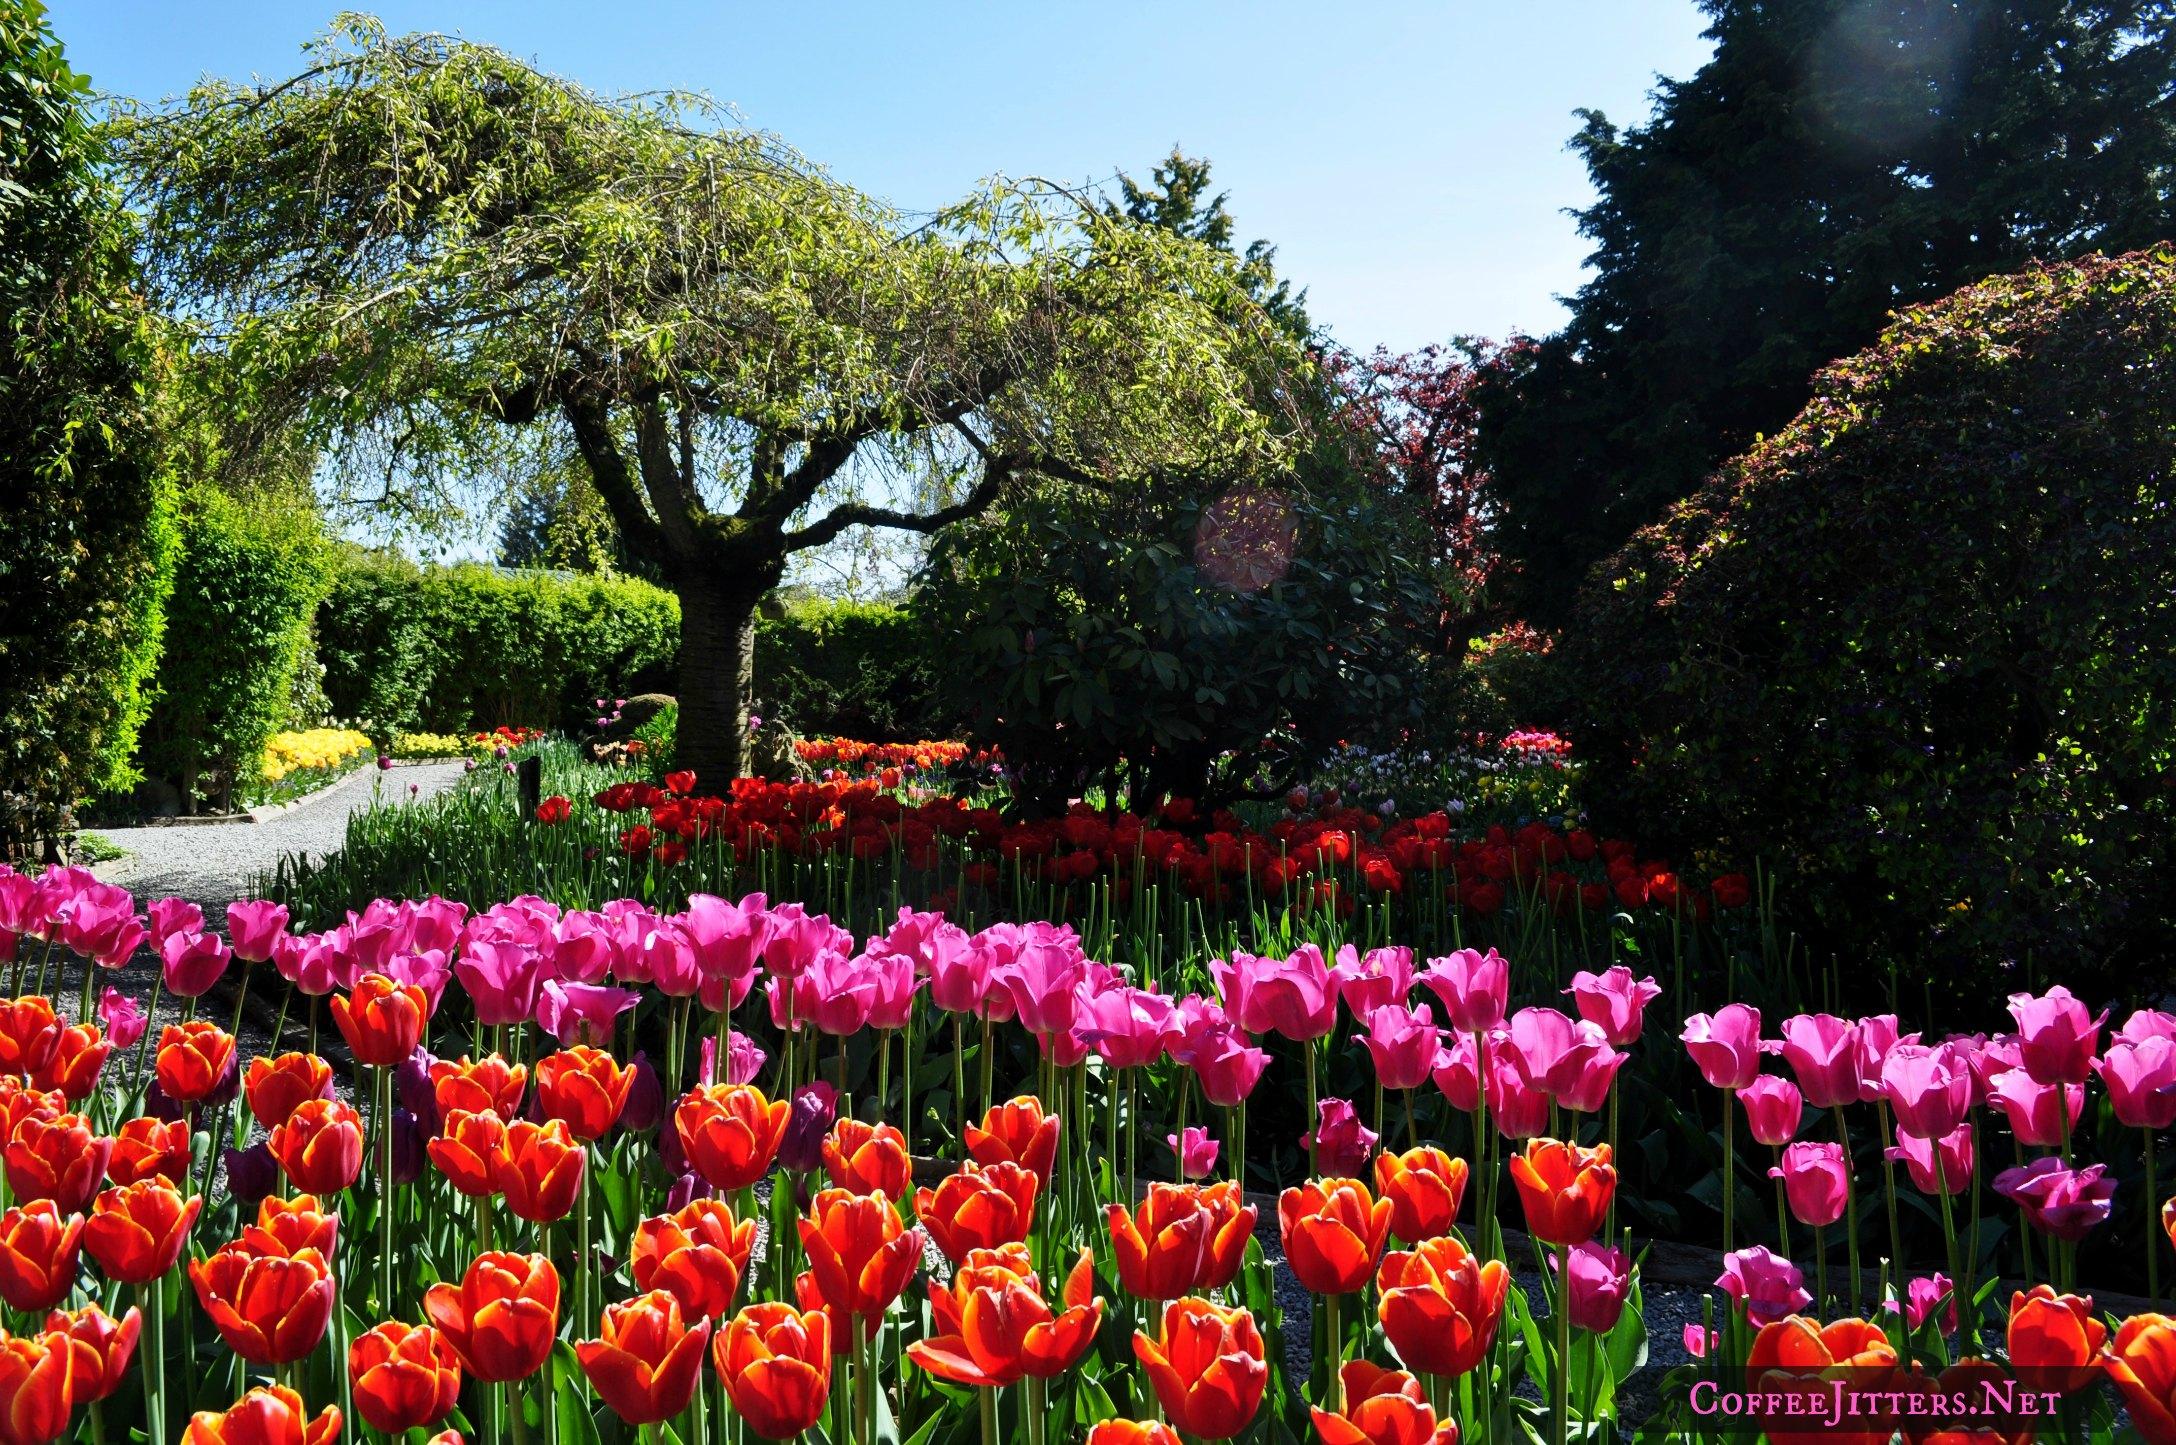 We tiptoed through the tulips